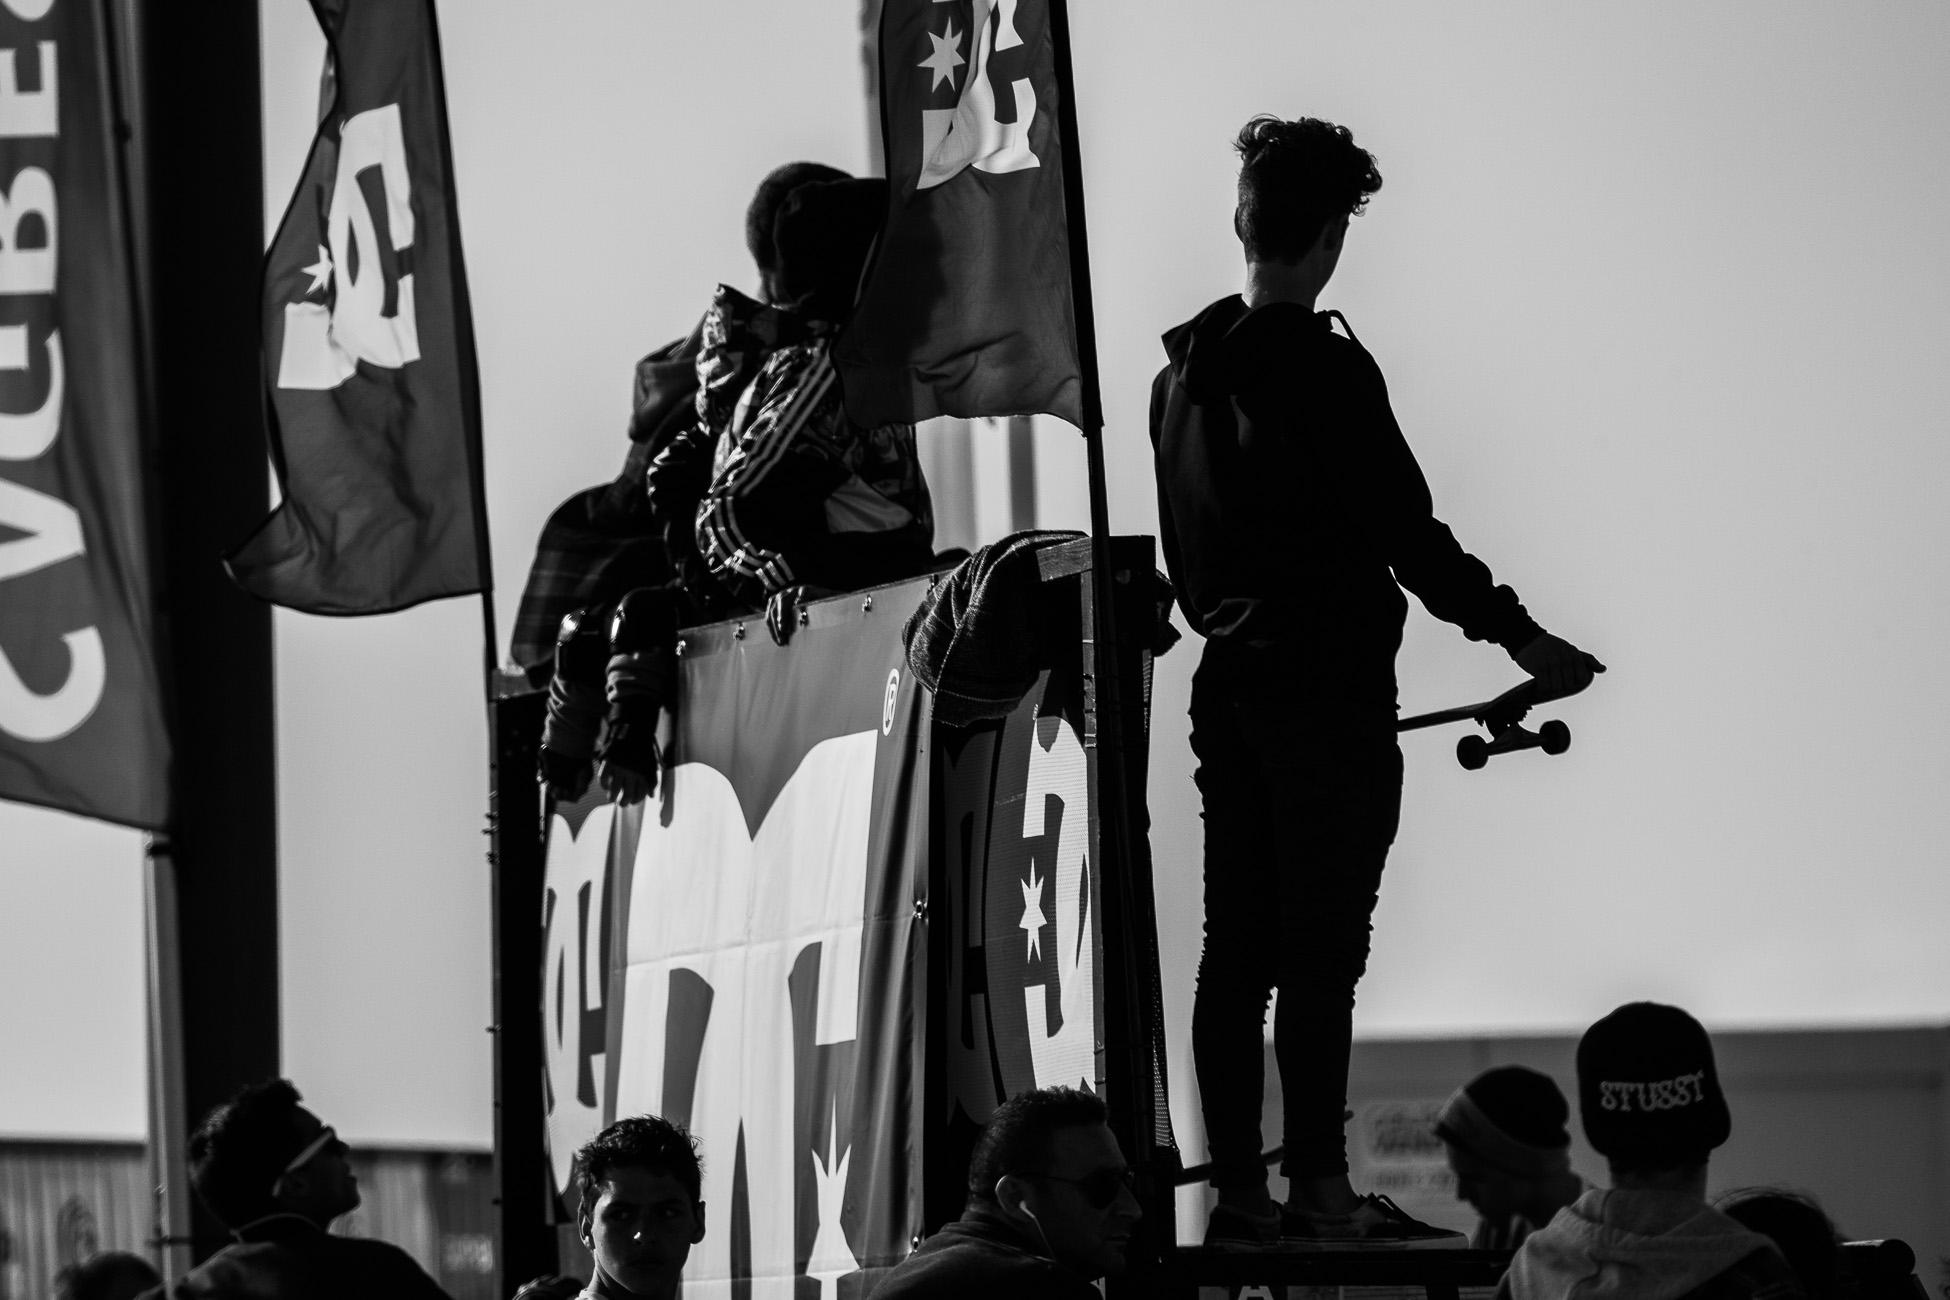 Gonçalo Barriga Lifestyle Photographer - Skate culture